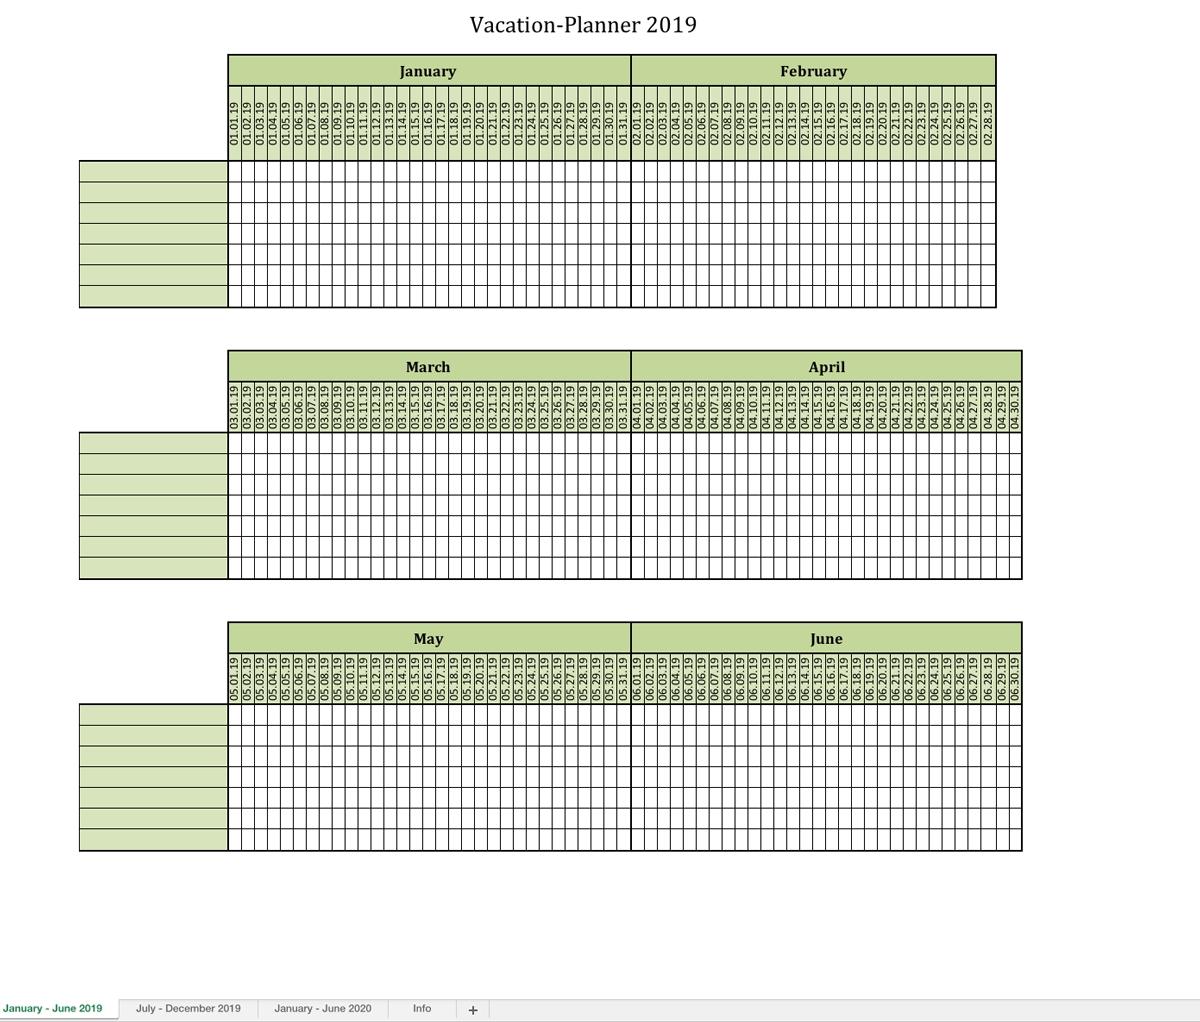 Vacation-Planner 2019-Employee Vacation Calendar Template